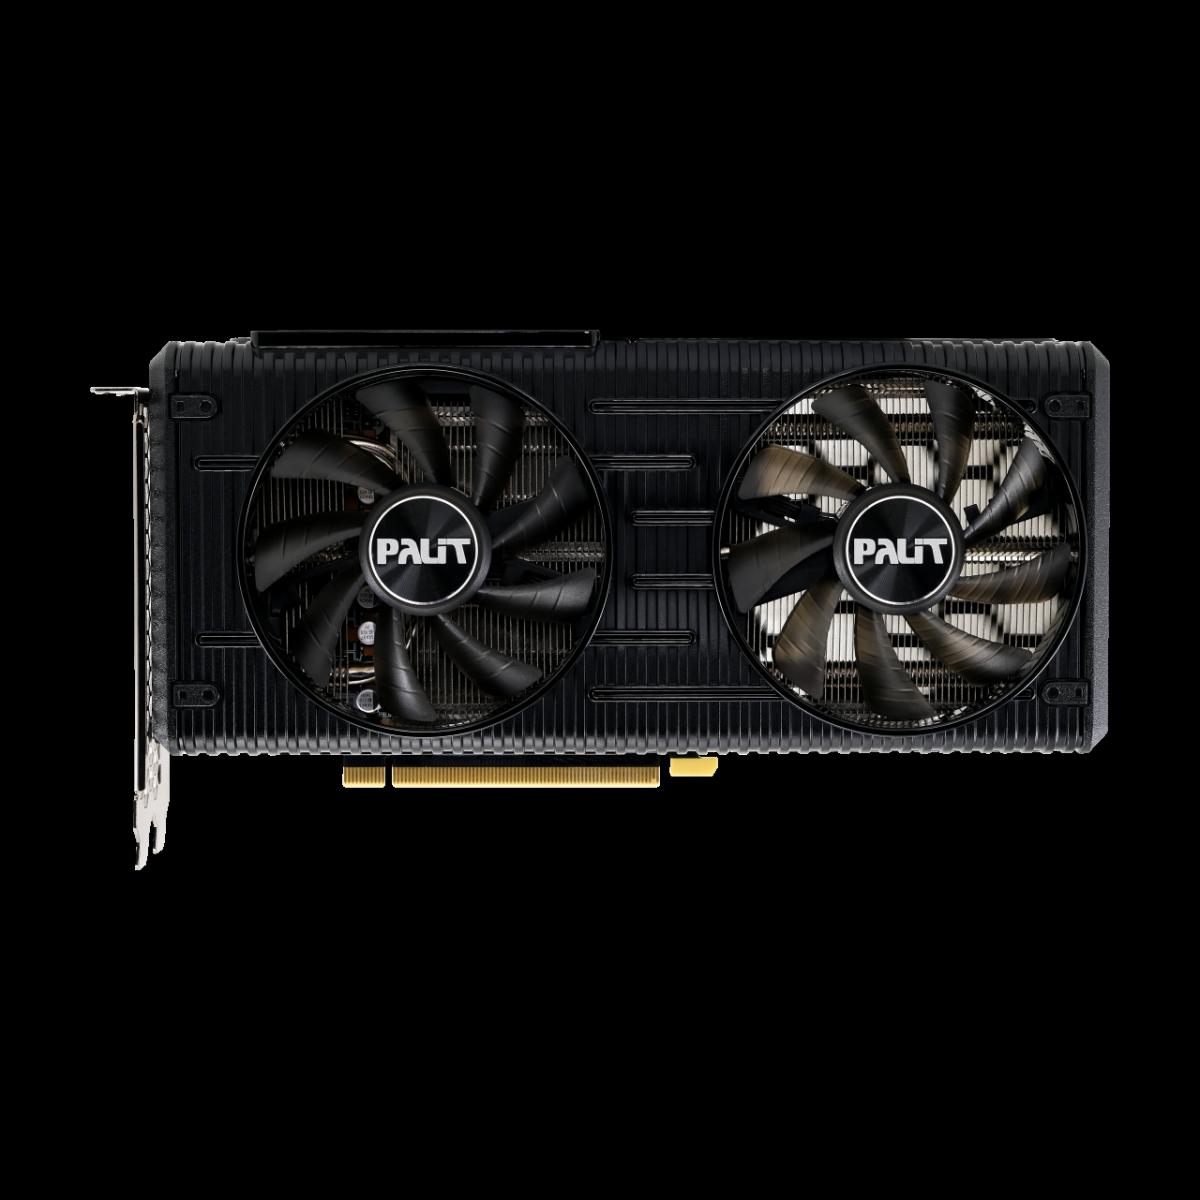 Placa de Vídeo Palit NVIDIA GeForce RTX 3060 Dual, 12GB, GDDR6, 192bit, LHR, NE63060019K9-190AD